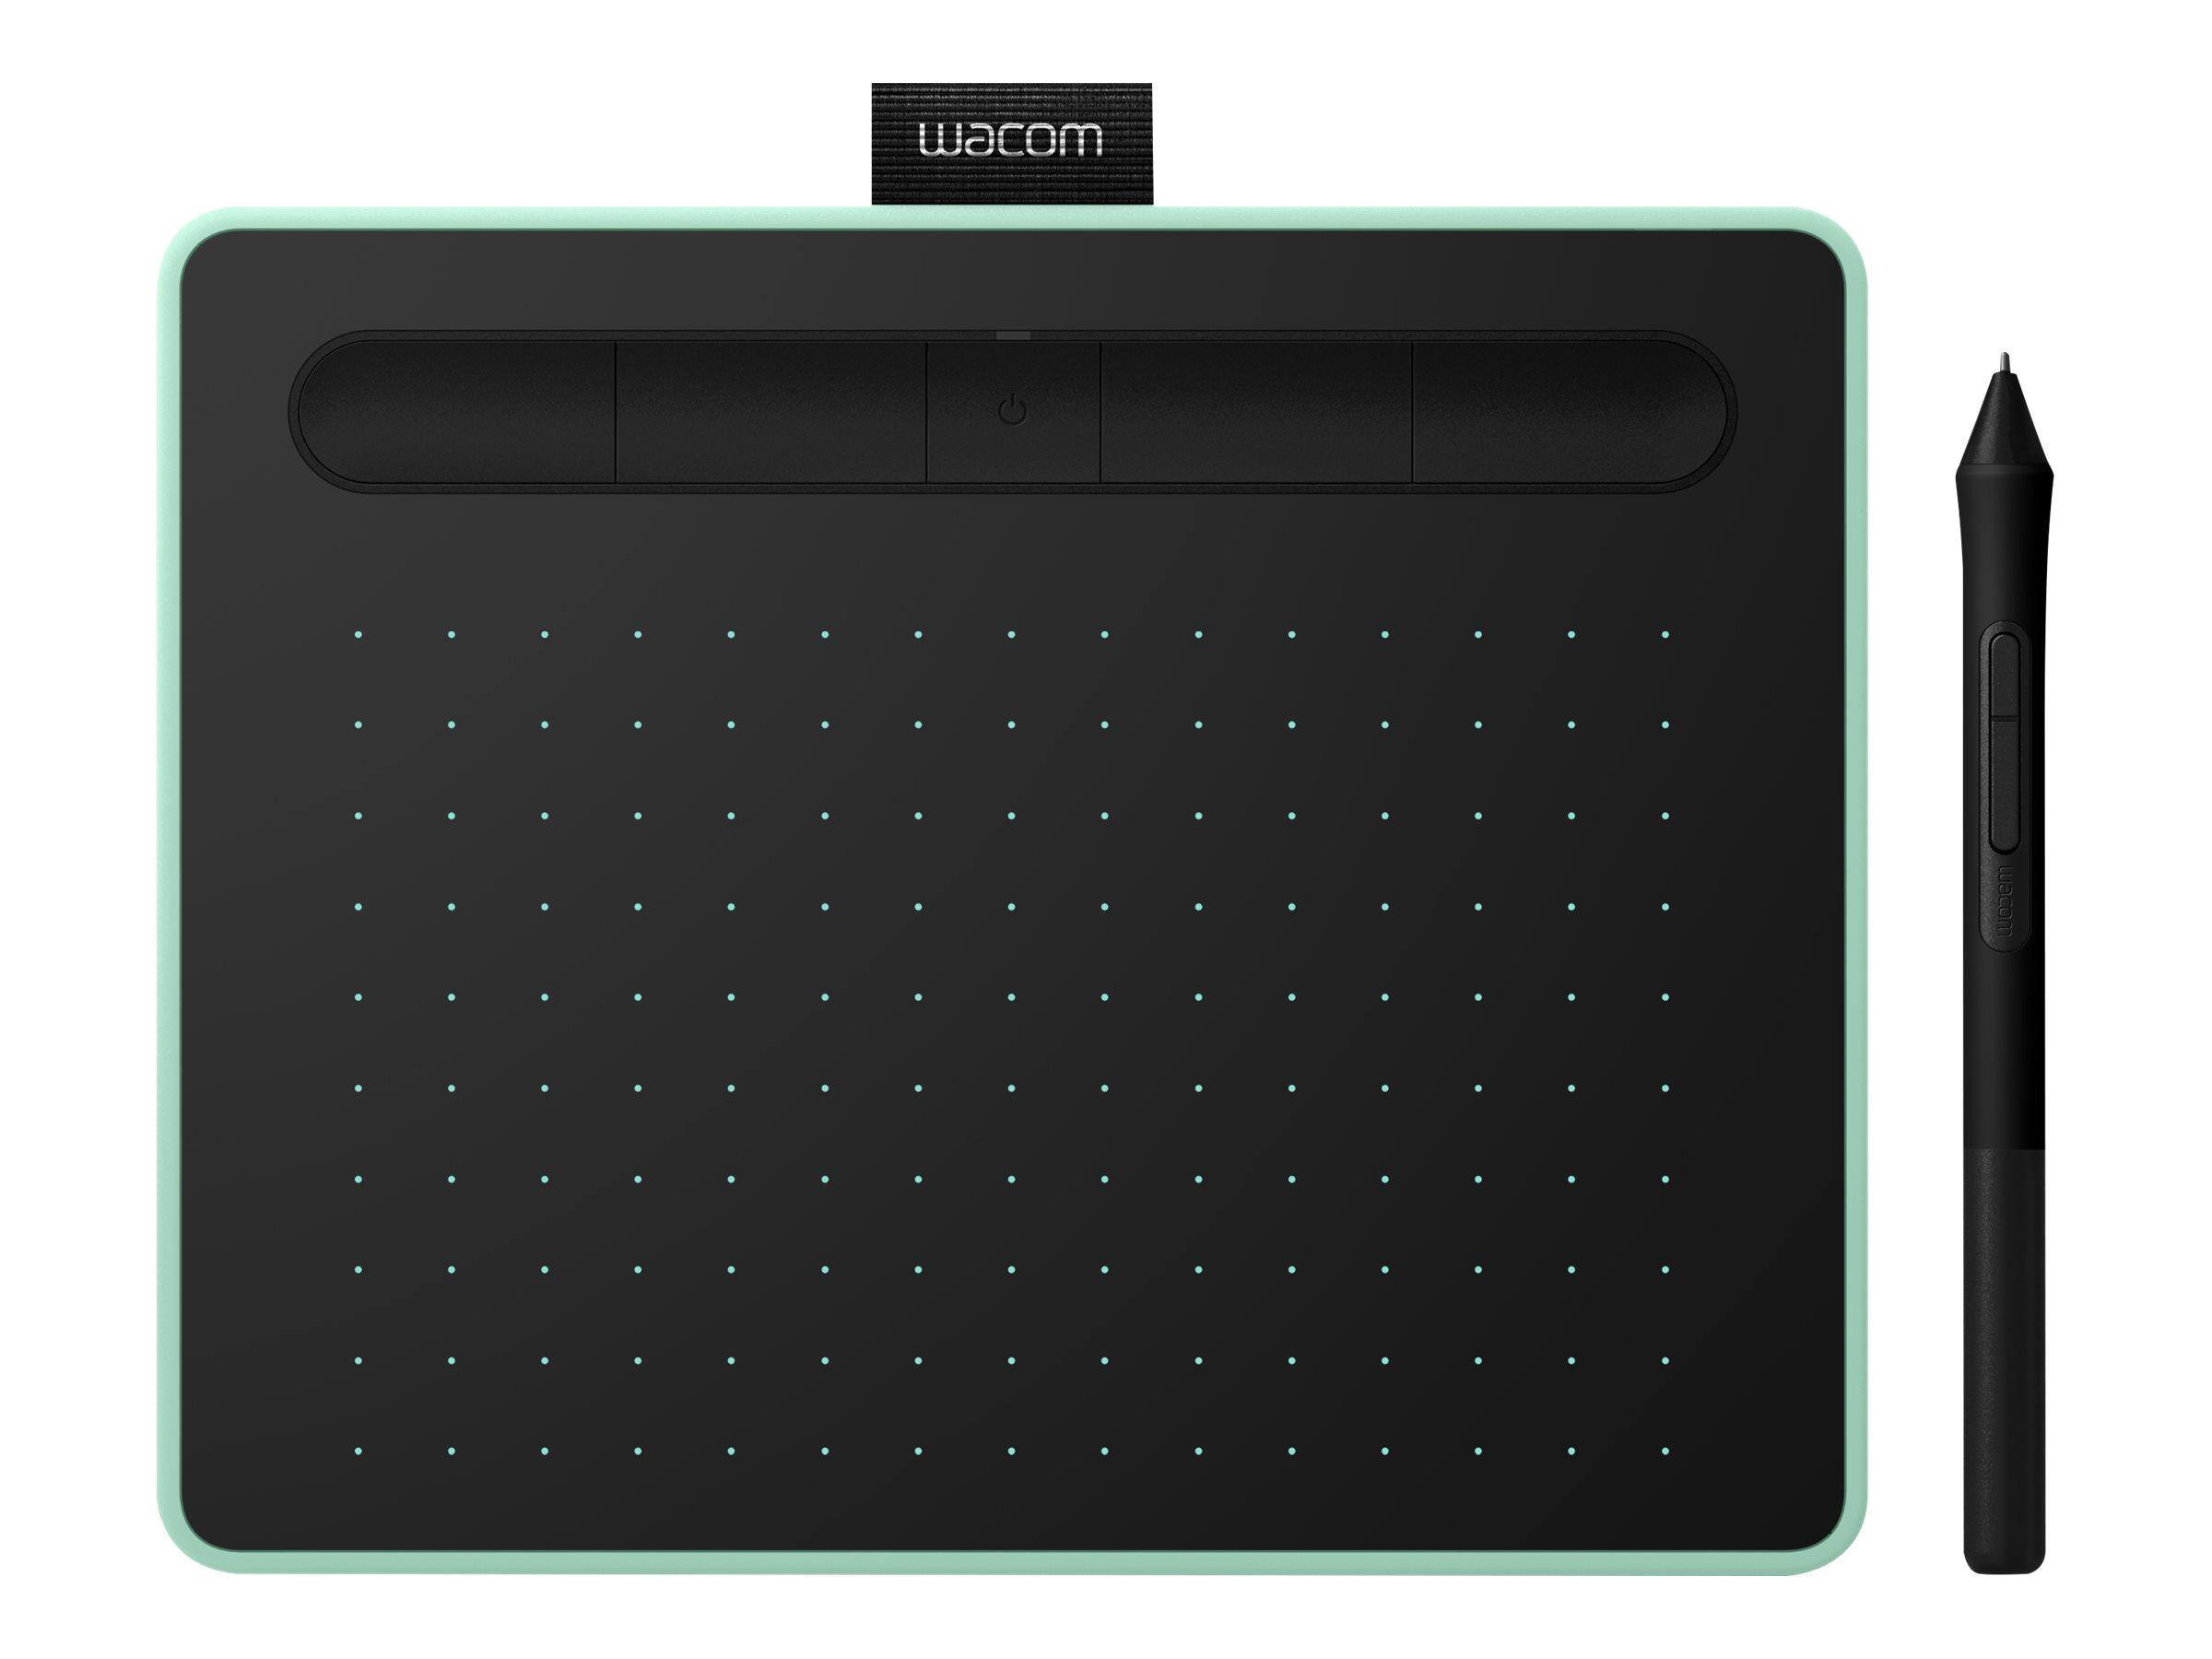 Wacom Intuos Creative Pen Small - Digitalisierer - 15.2 x 9.5 cm - elektromagnetisch - 4 Tasten - kabellos, kabelgebunden